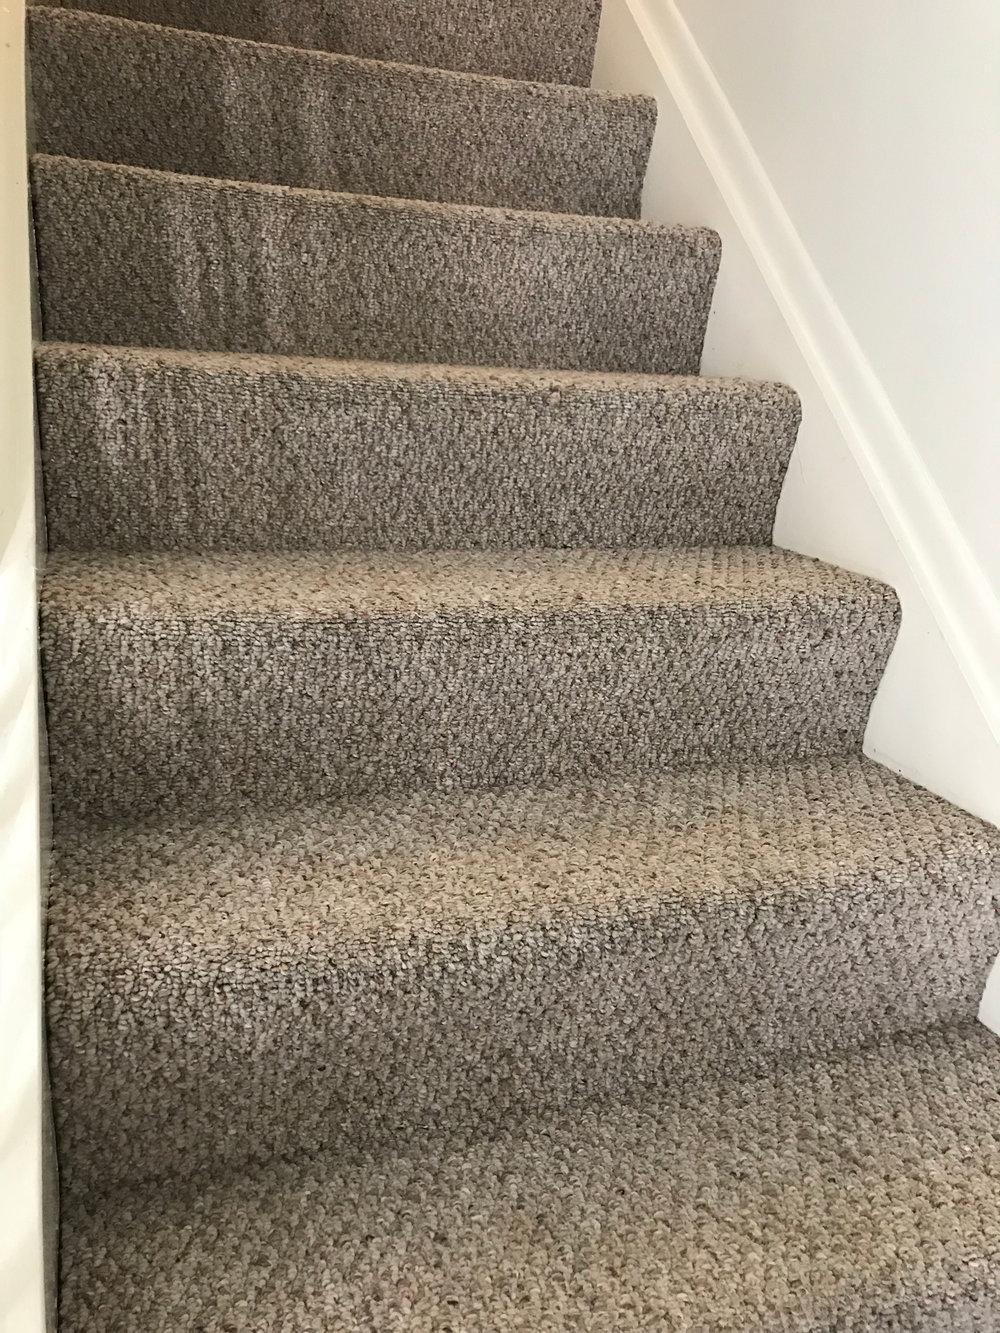 sterling-heights-stair-cleaning-918.jpg